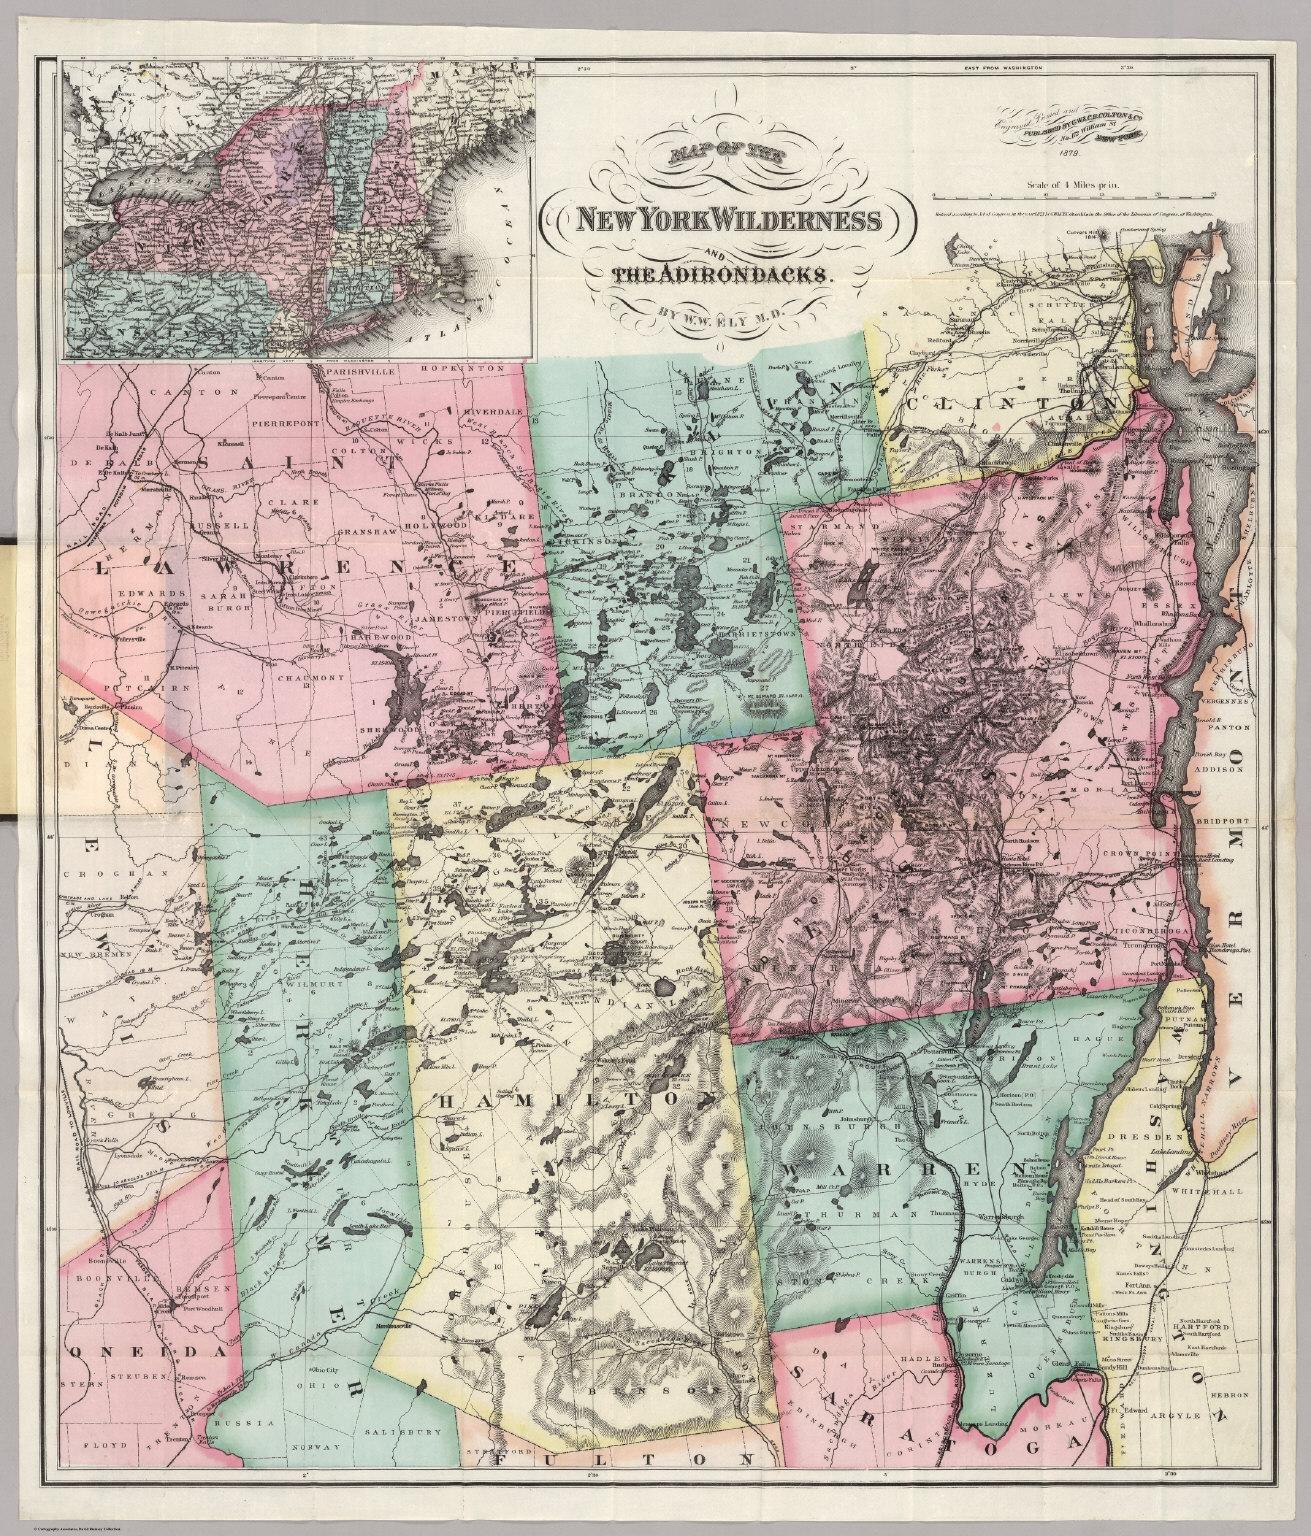 New York Wilderness And The Adirondacks - David Rumsey ... Map Adirondacks on new york map, pinckney chain of lakes map, great sacandaga lake map, binghamton map, ny map, boston map, watertown map, gunks map, cape cod map, philadelphia map, plattsburgh map, colorado scenic drives map, mount marcy trail map, essex chain lakes map, albany map, saranac lake map, hiking map, lake placid map, long island map, schenectady map,